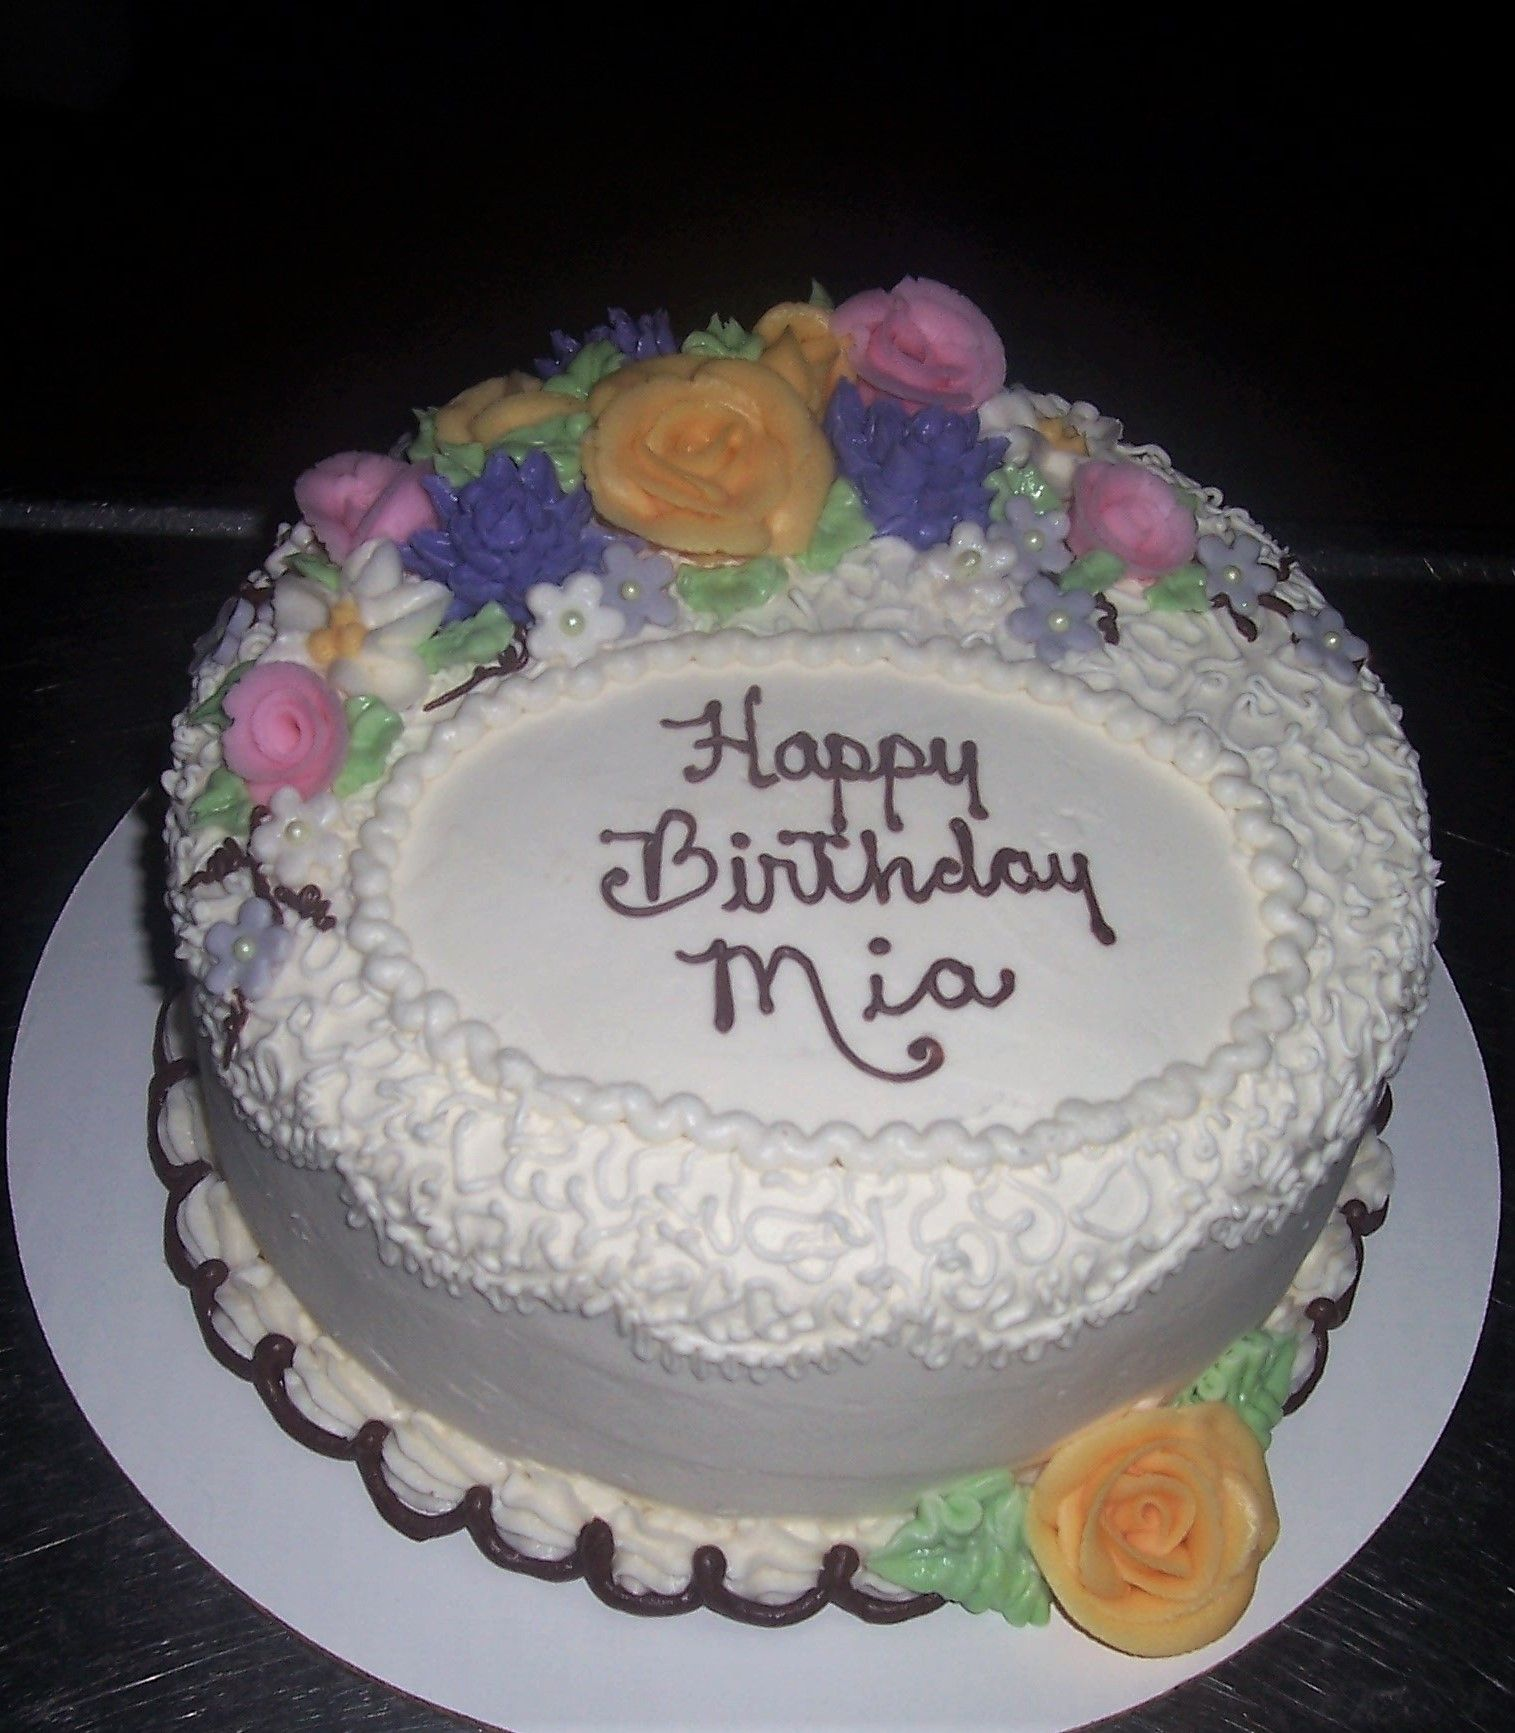 3 Layer Chocolate Cake With Vanilla Buttercream Buttercream